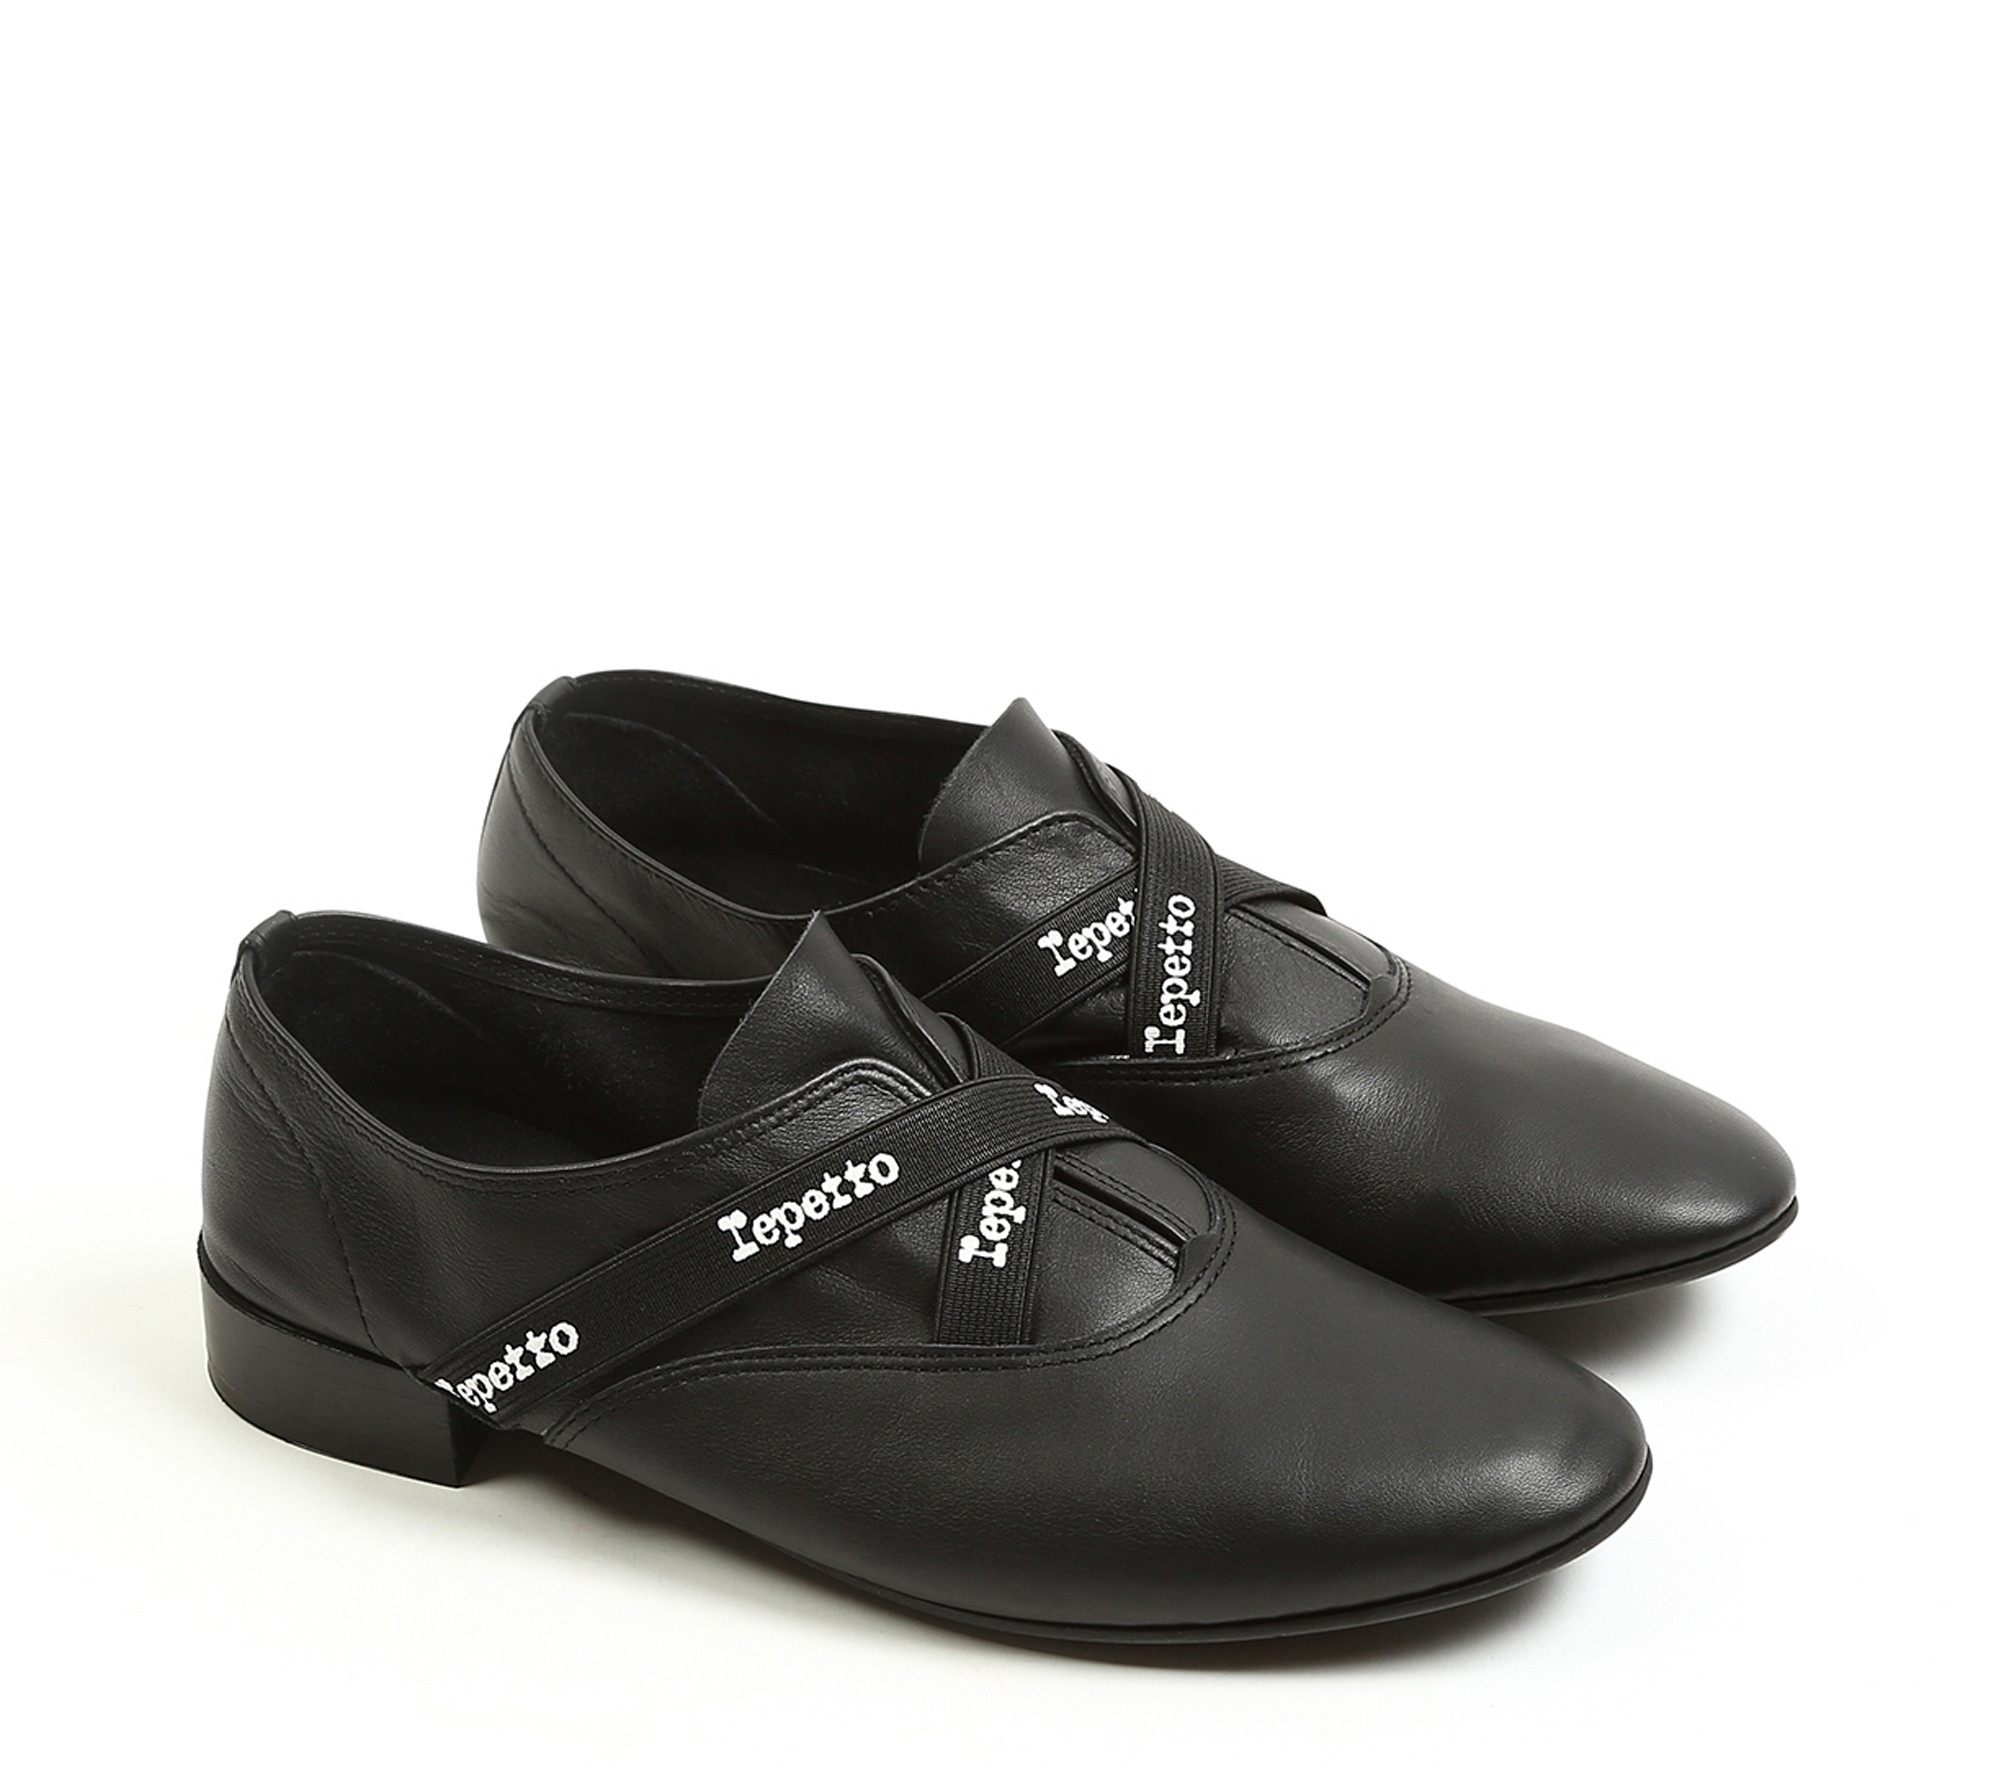 Joao oxford shoes